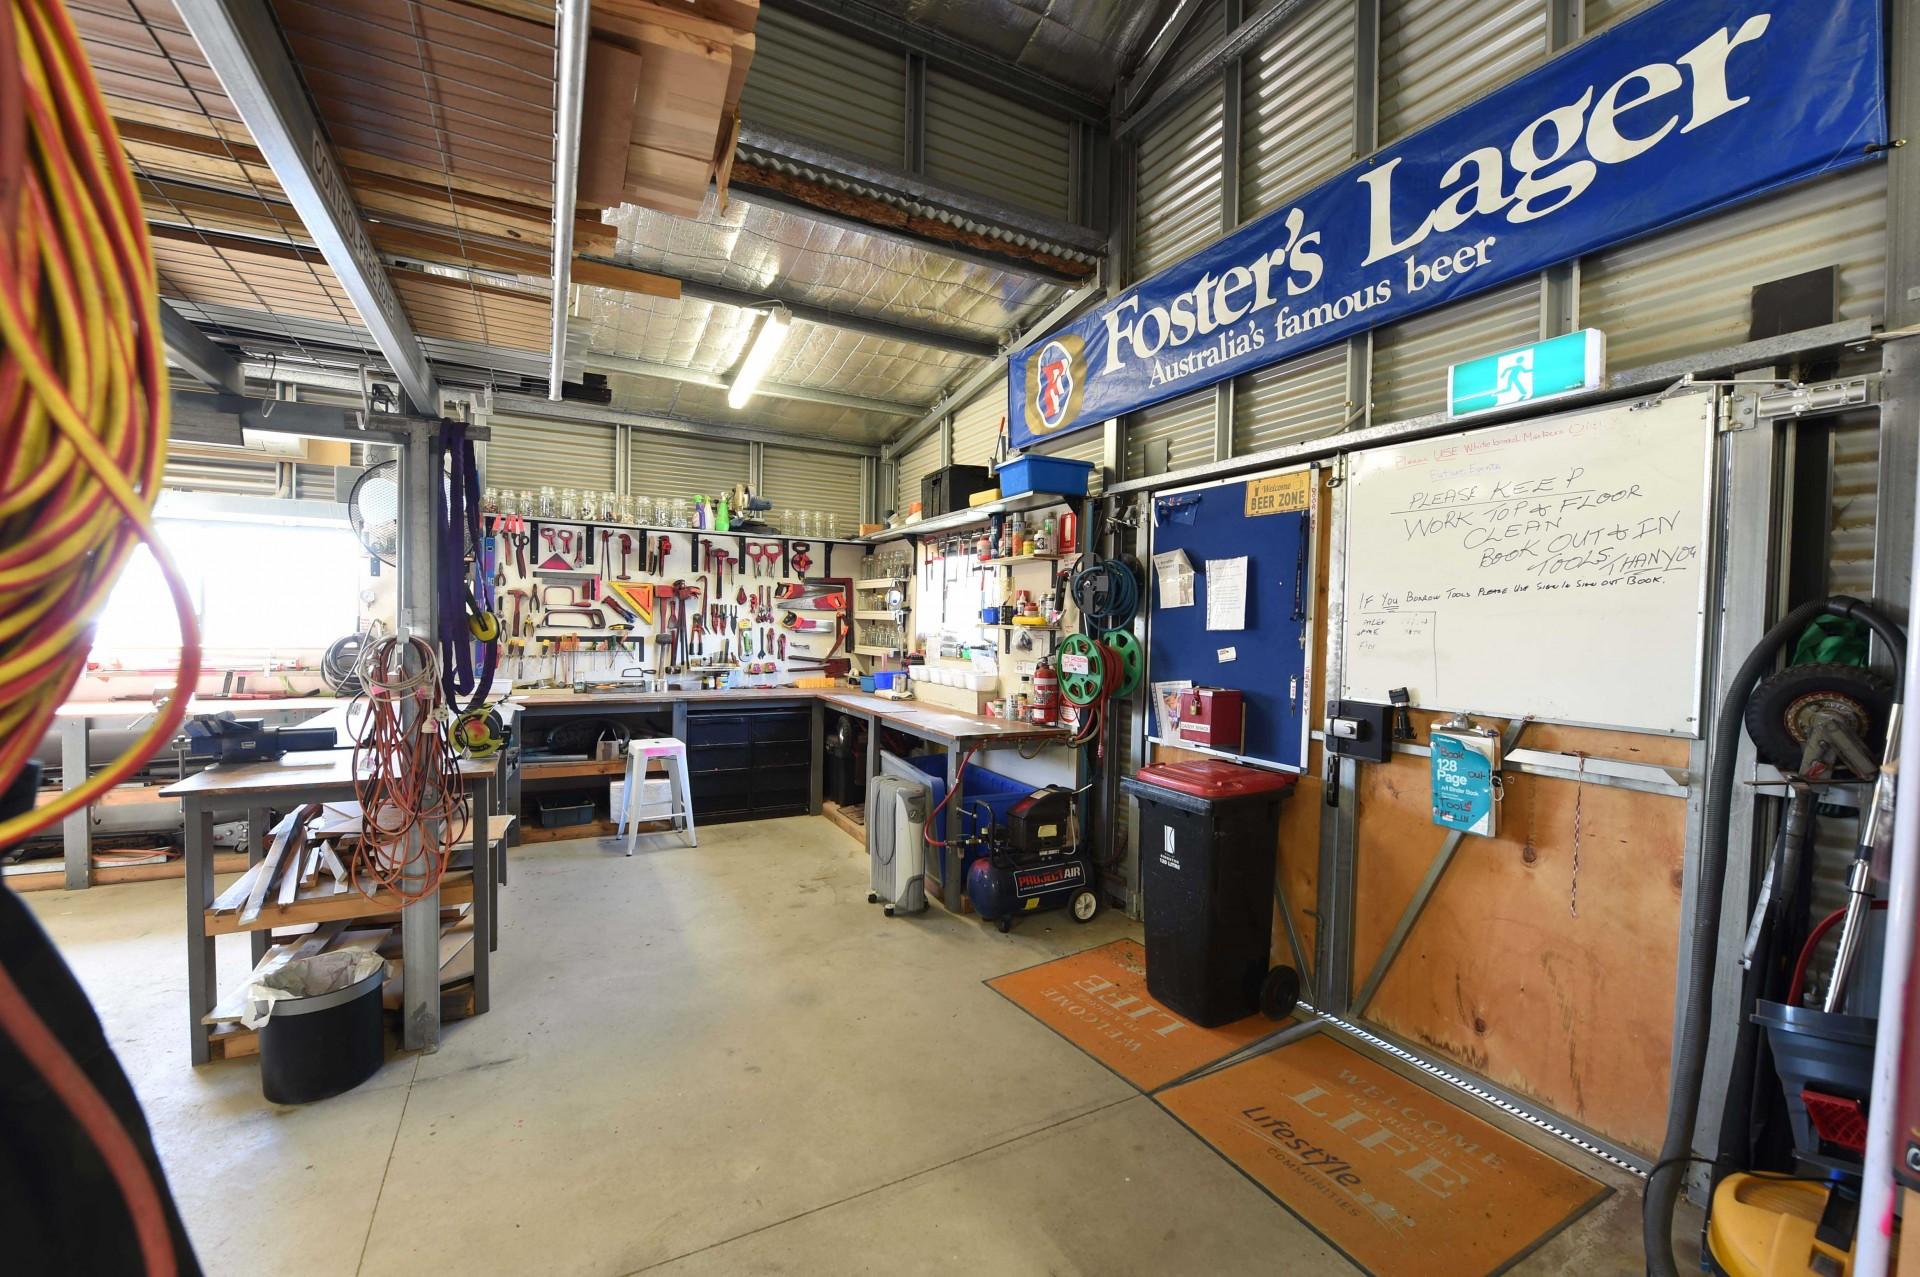 Lifestyle Chelsea heights workshop